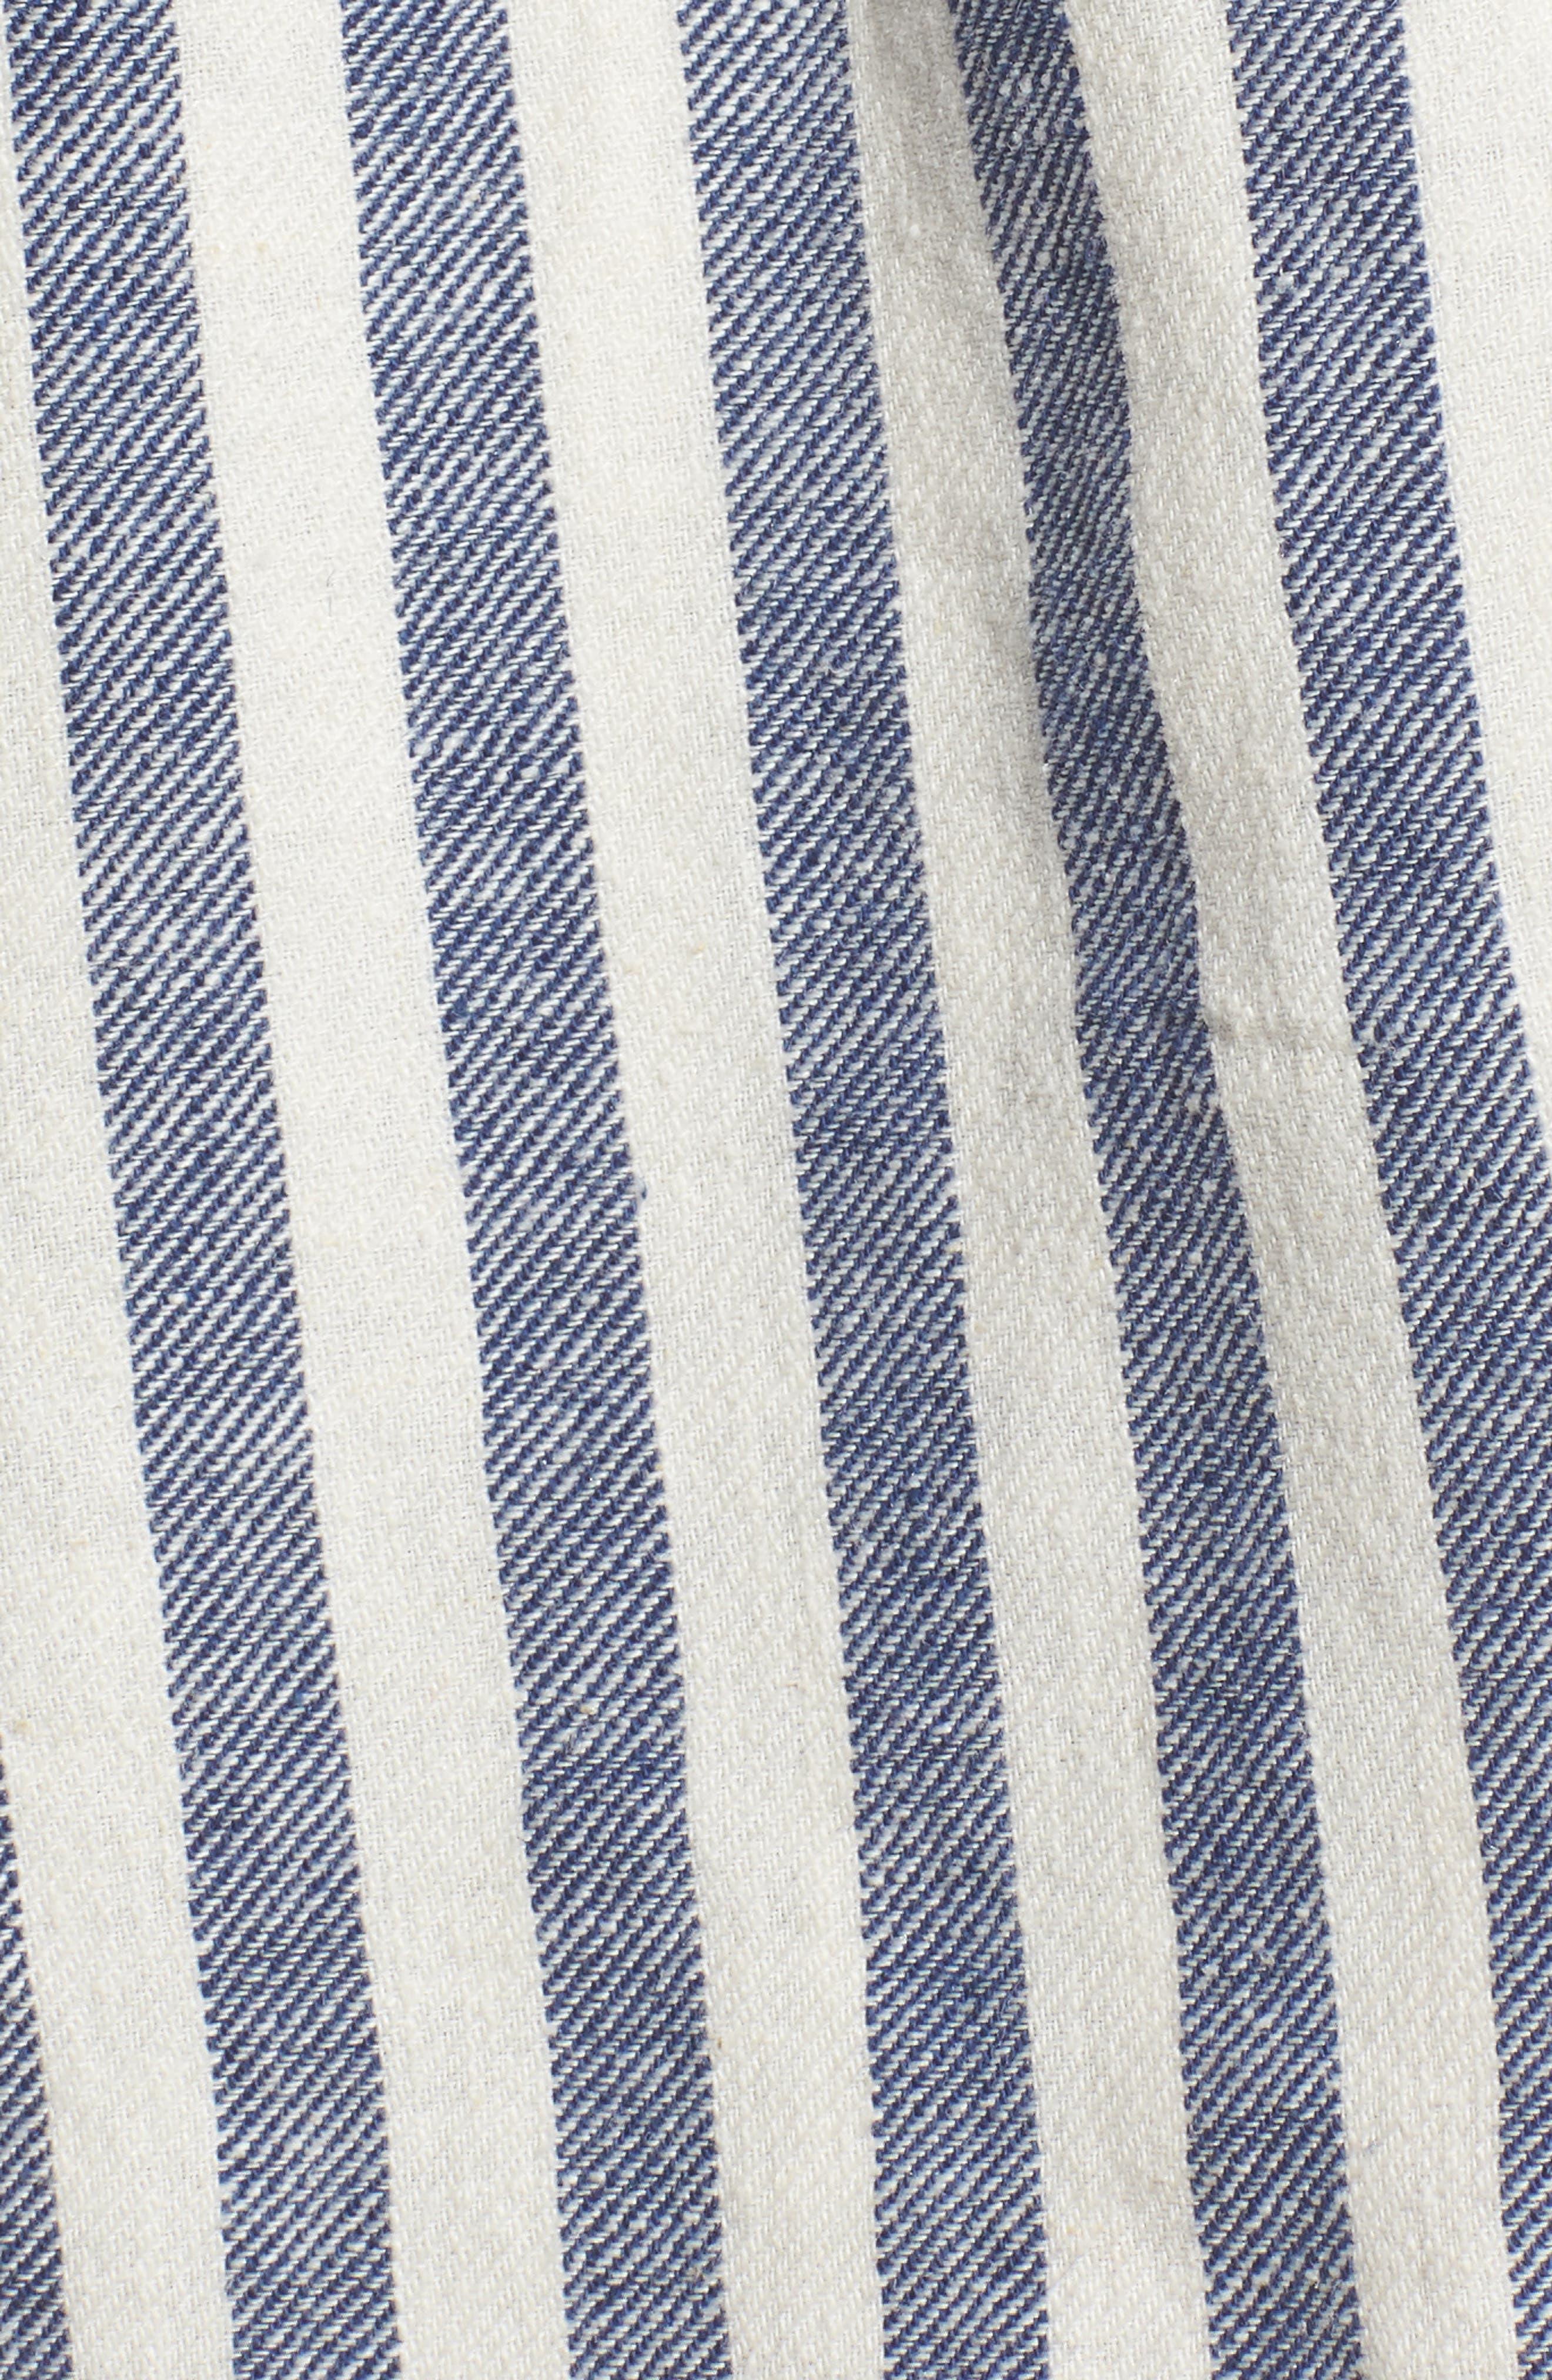 Stripe Linen Blend Shorts,                             Alternate thumbnail 5, color,                             903